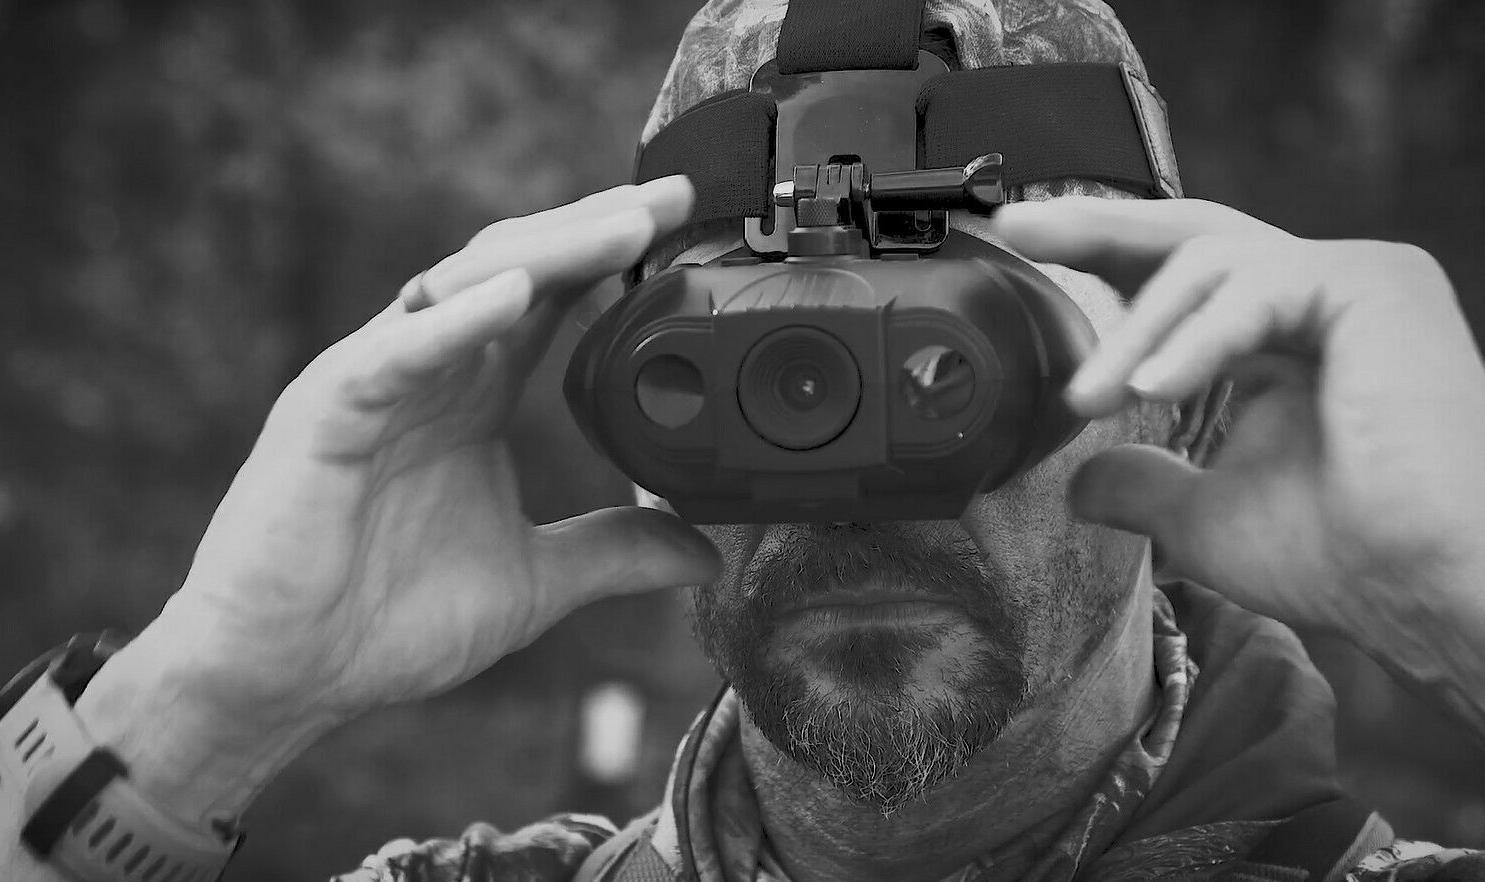 X-Vision Hands-Free Digital Night Vision Binocular